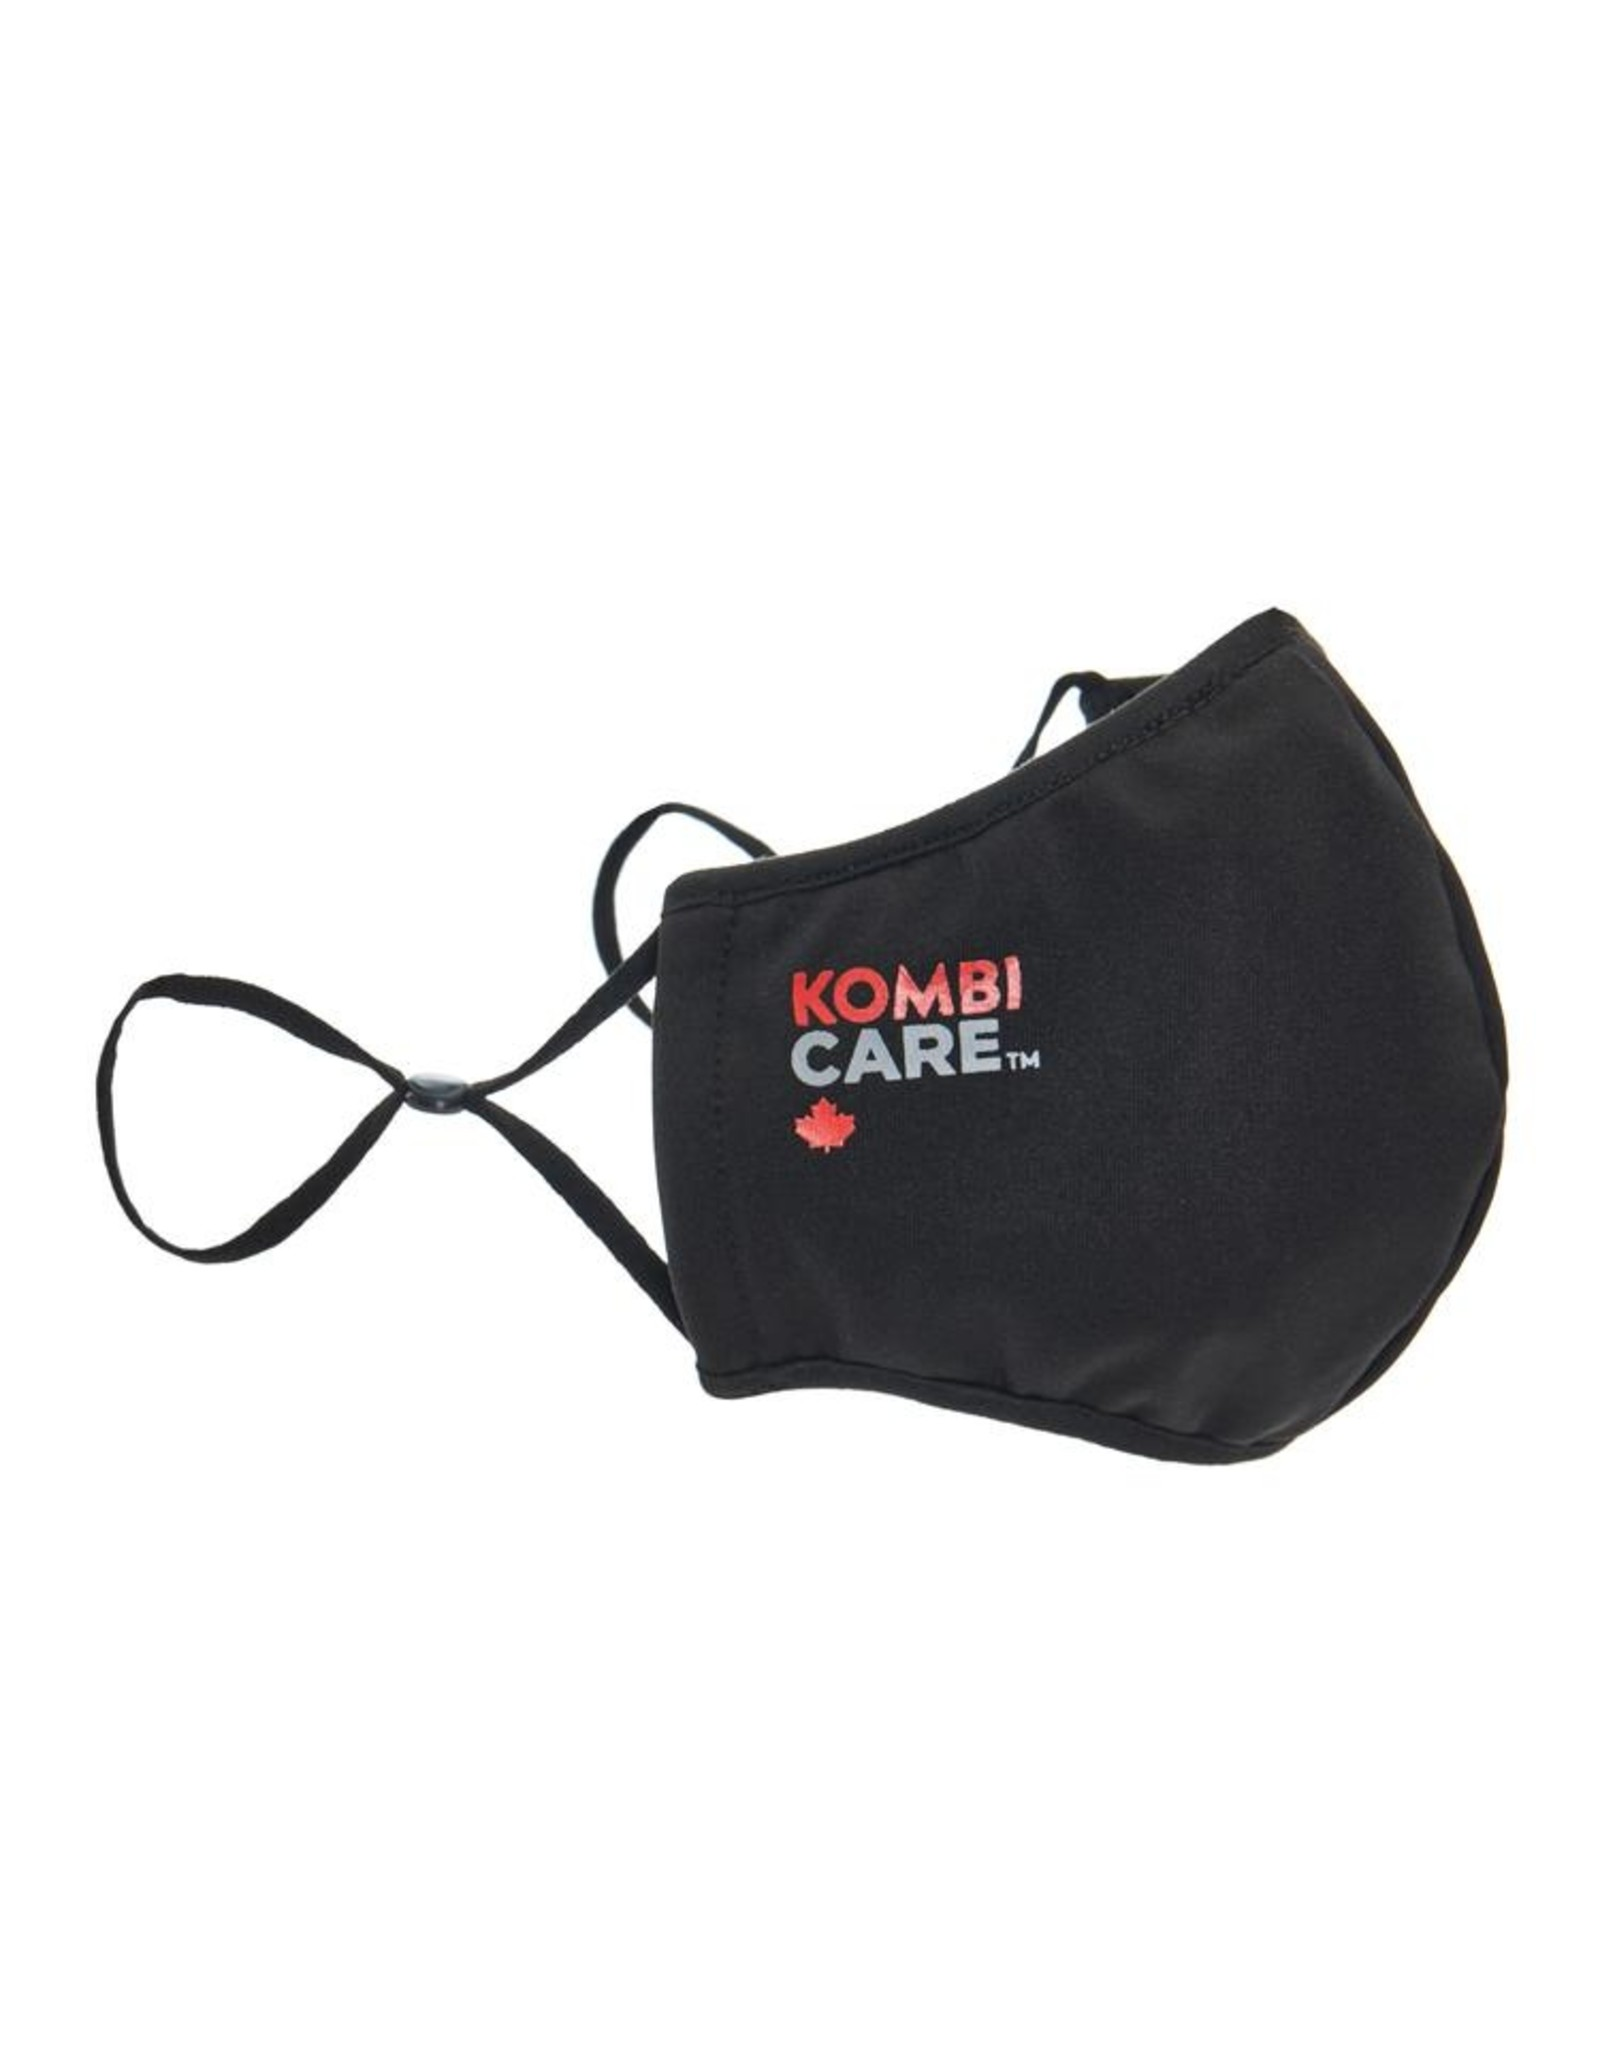 Kombi Kombi Everyday Face Mask